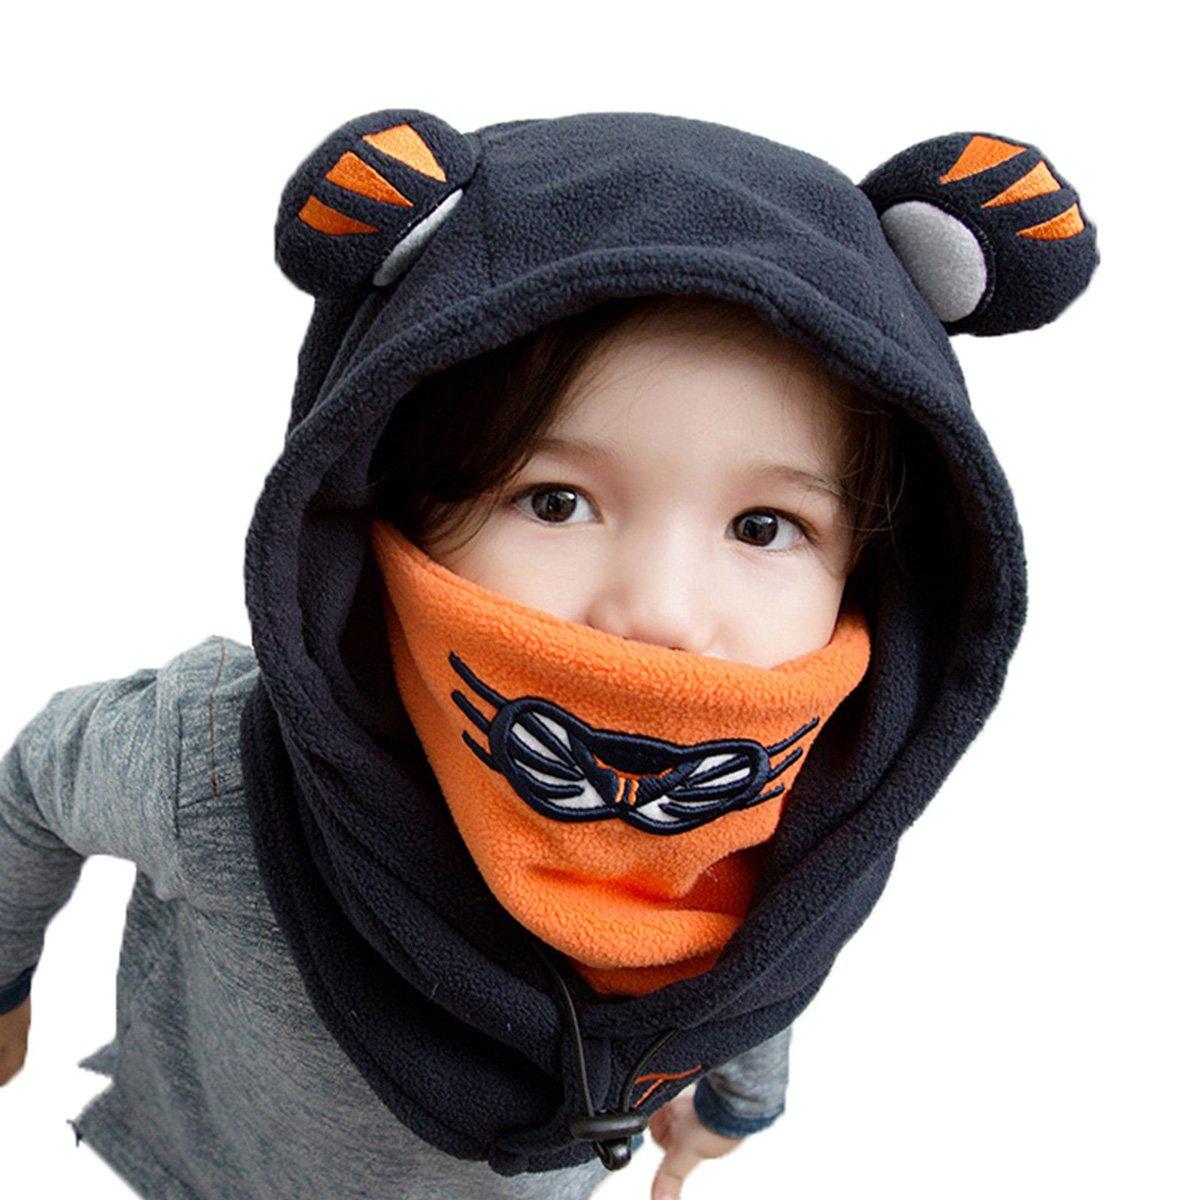 TRIWONDER Balaclava Hat for Kids Face Mask Thermal Fleece Neck Warmer Winter Ski Mask Full Face Cover Cap (Navy Blue - New Version)